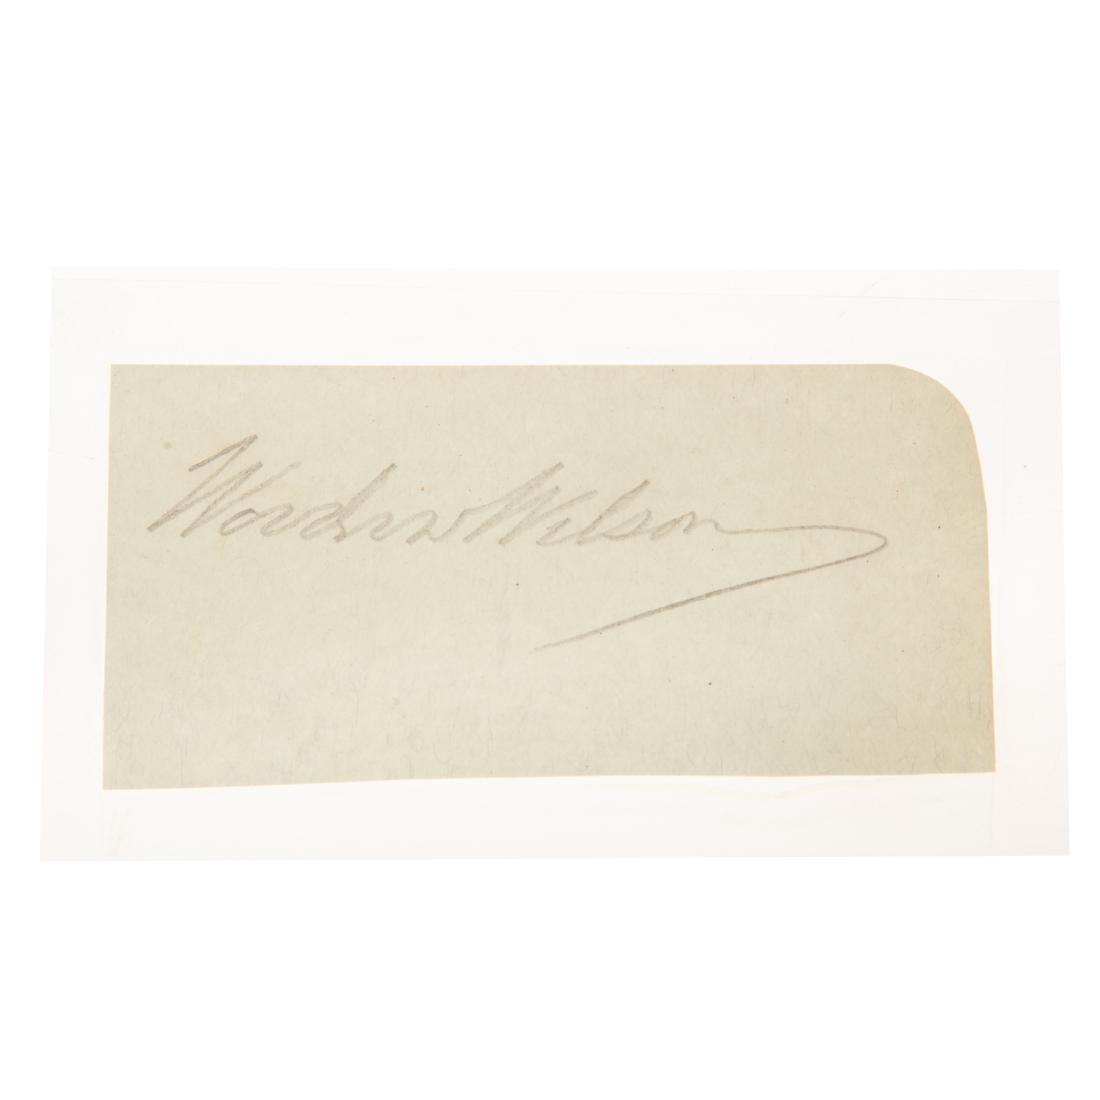 Thomas Woodrow Wilson signature - 2